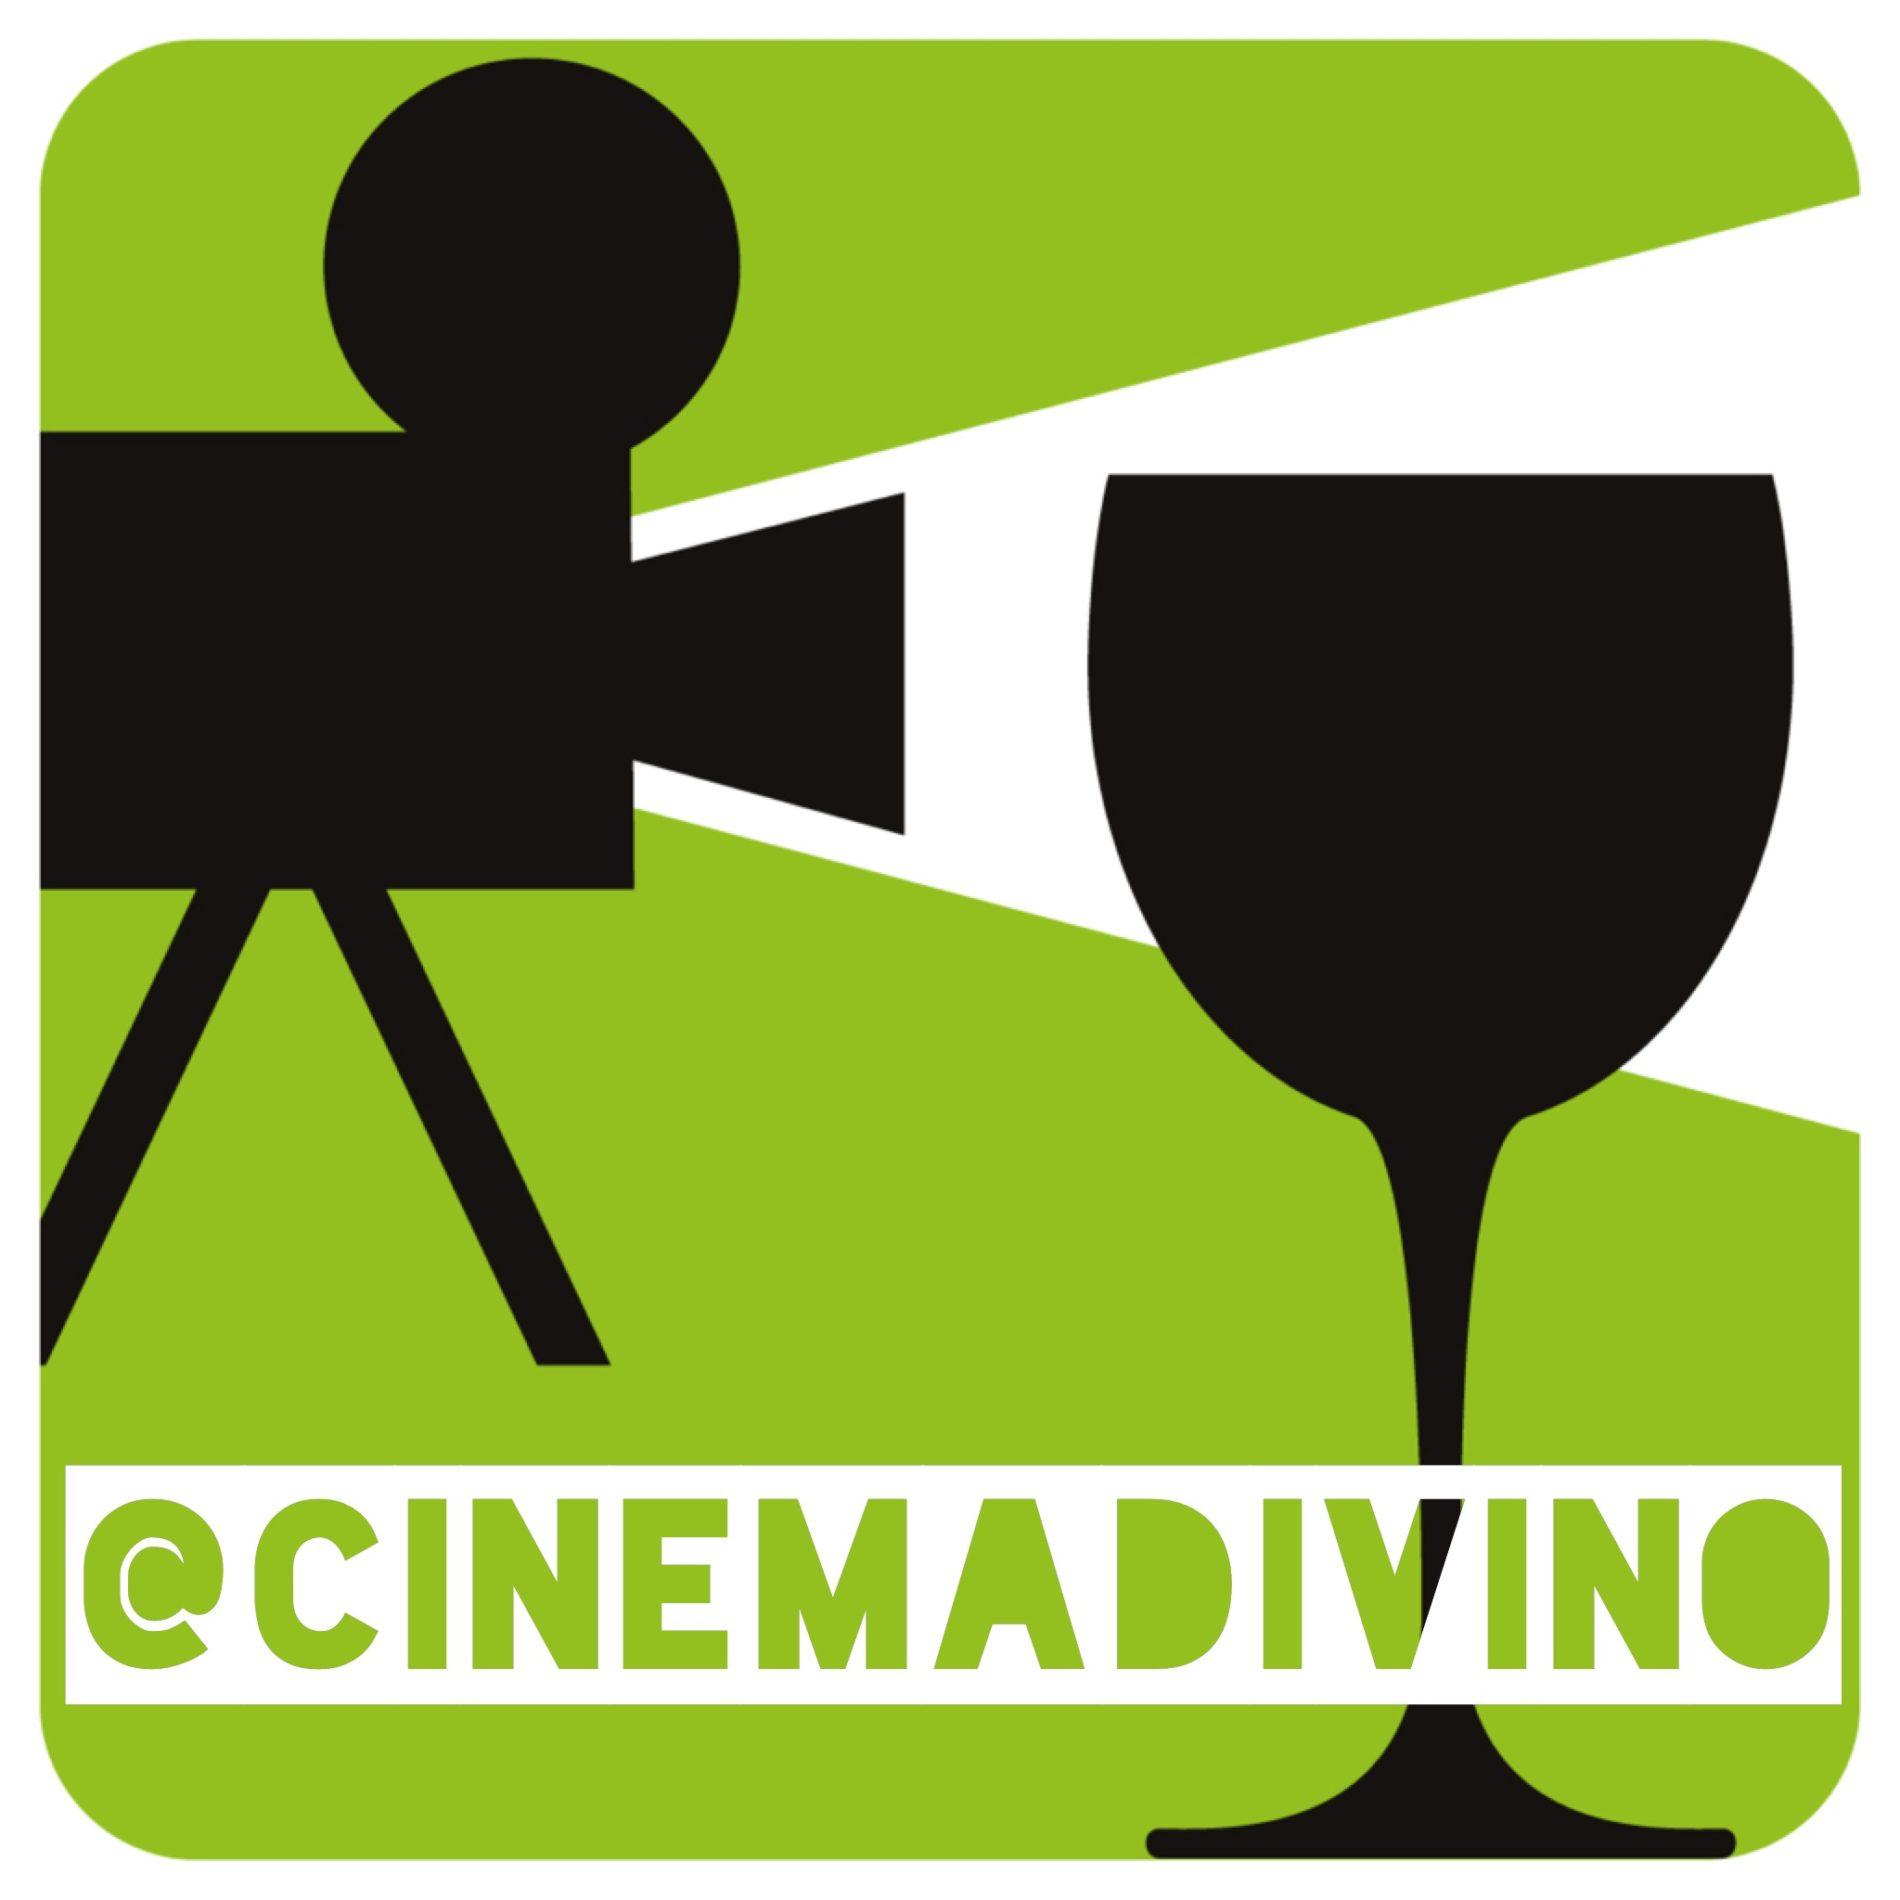 Cinemadivino 2018 in Friuli Venezia Giulia